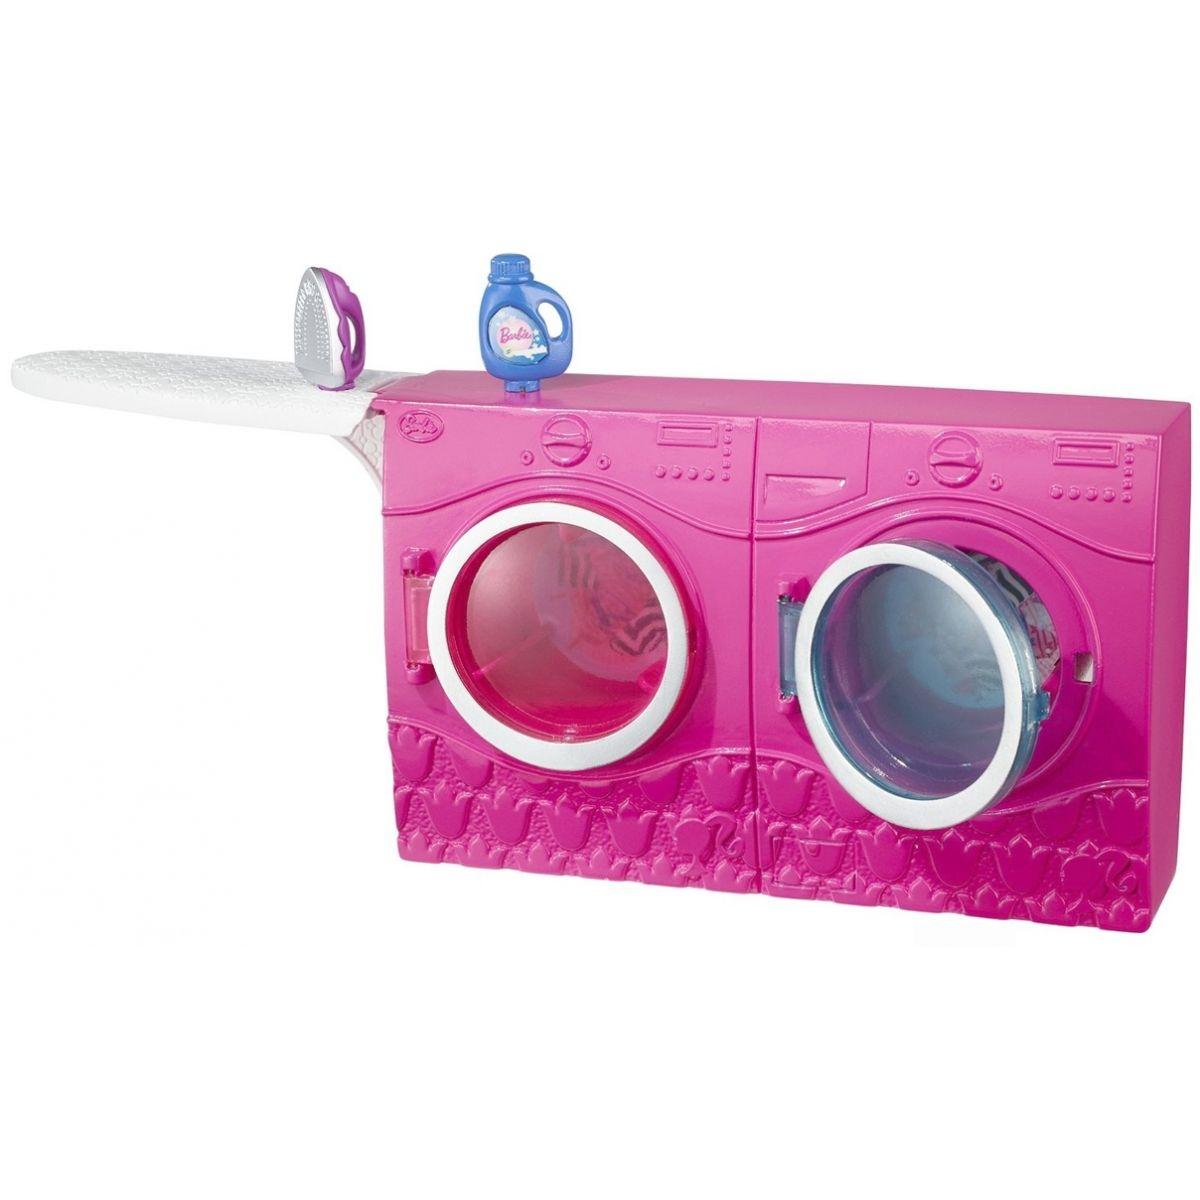 Barbie Nábytek - Pračka